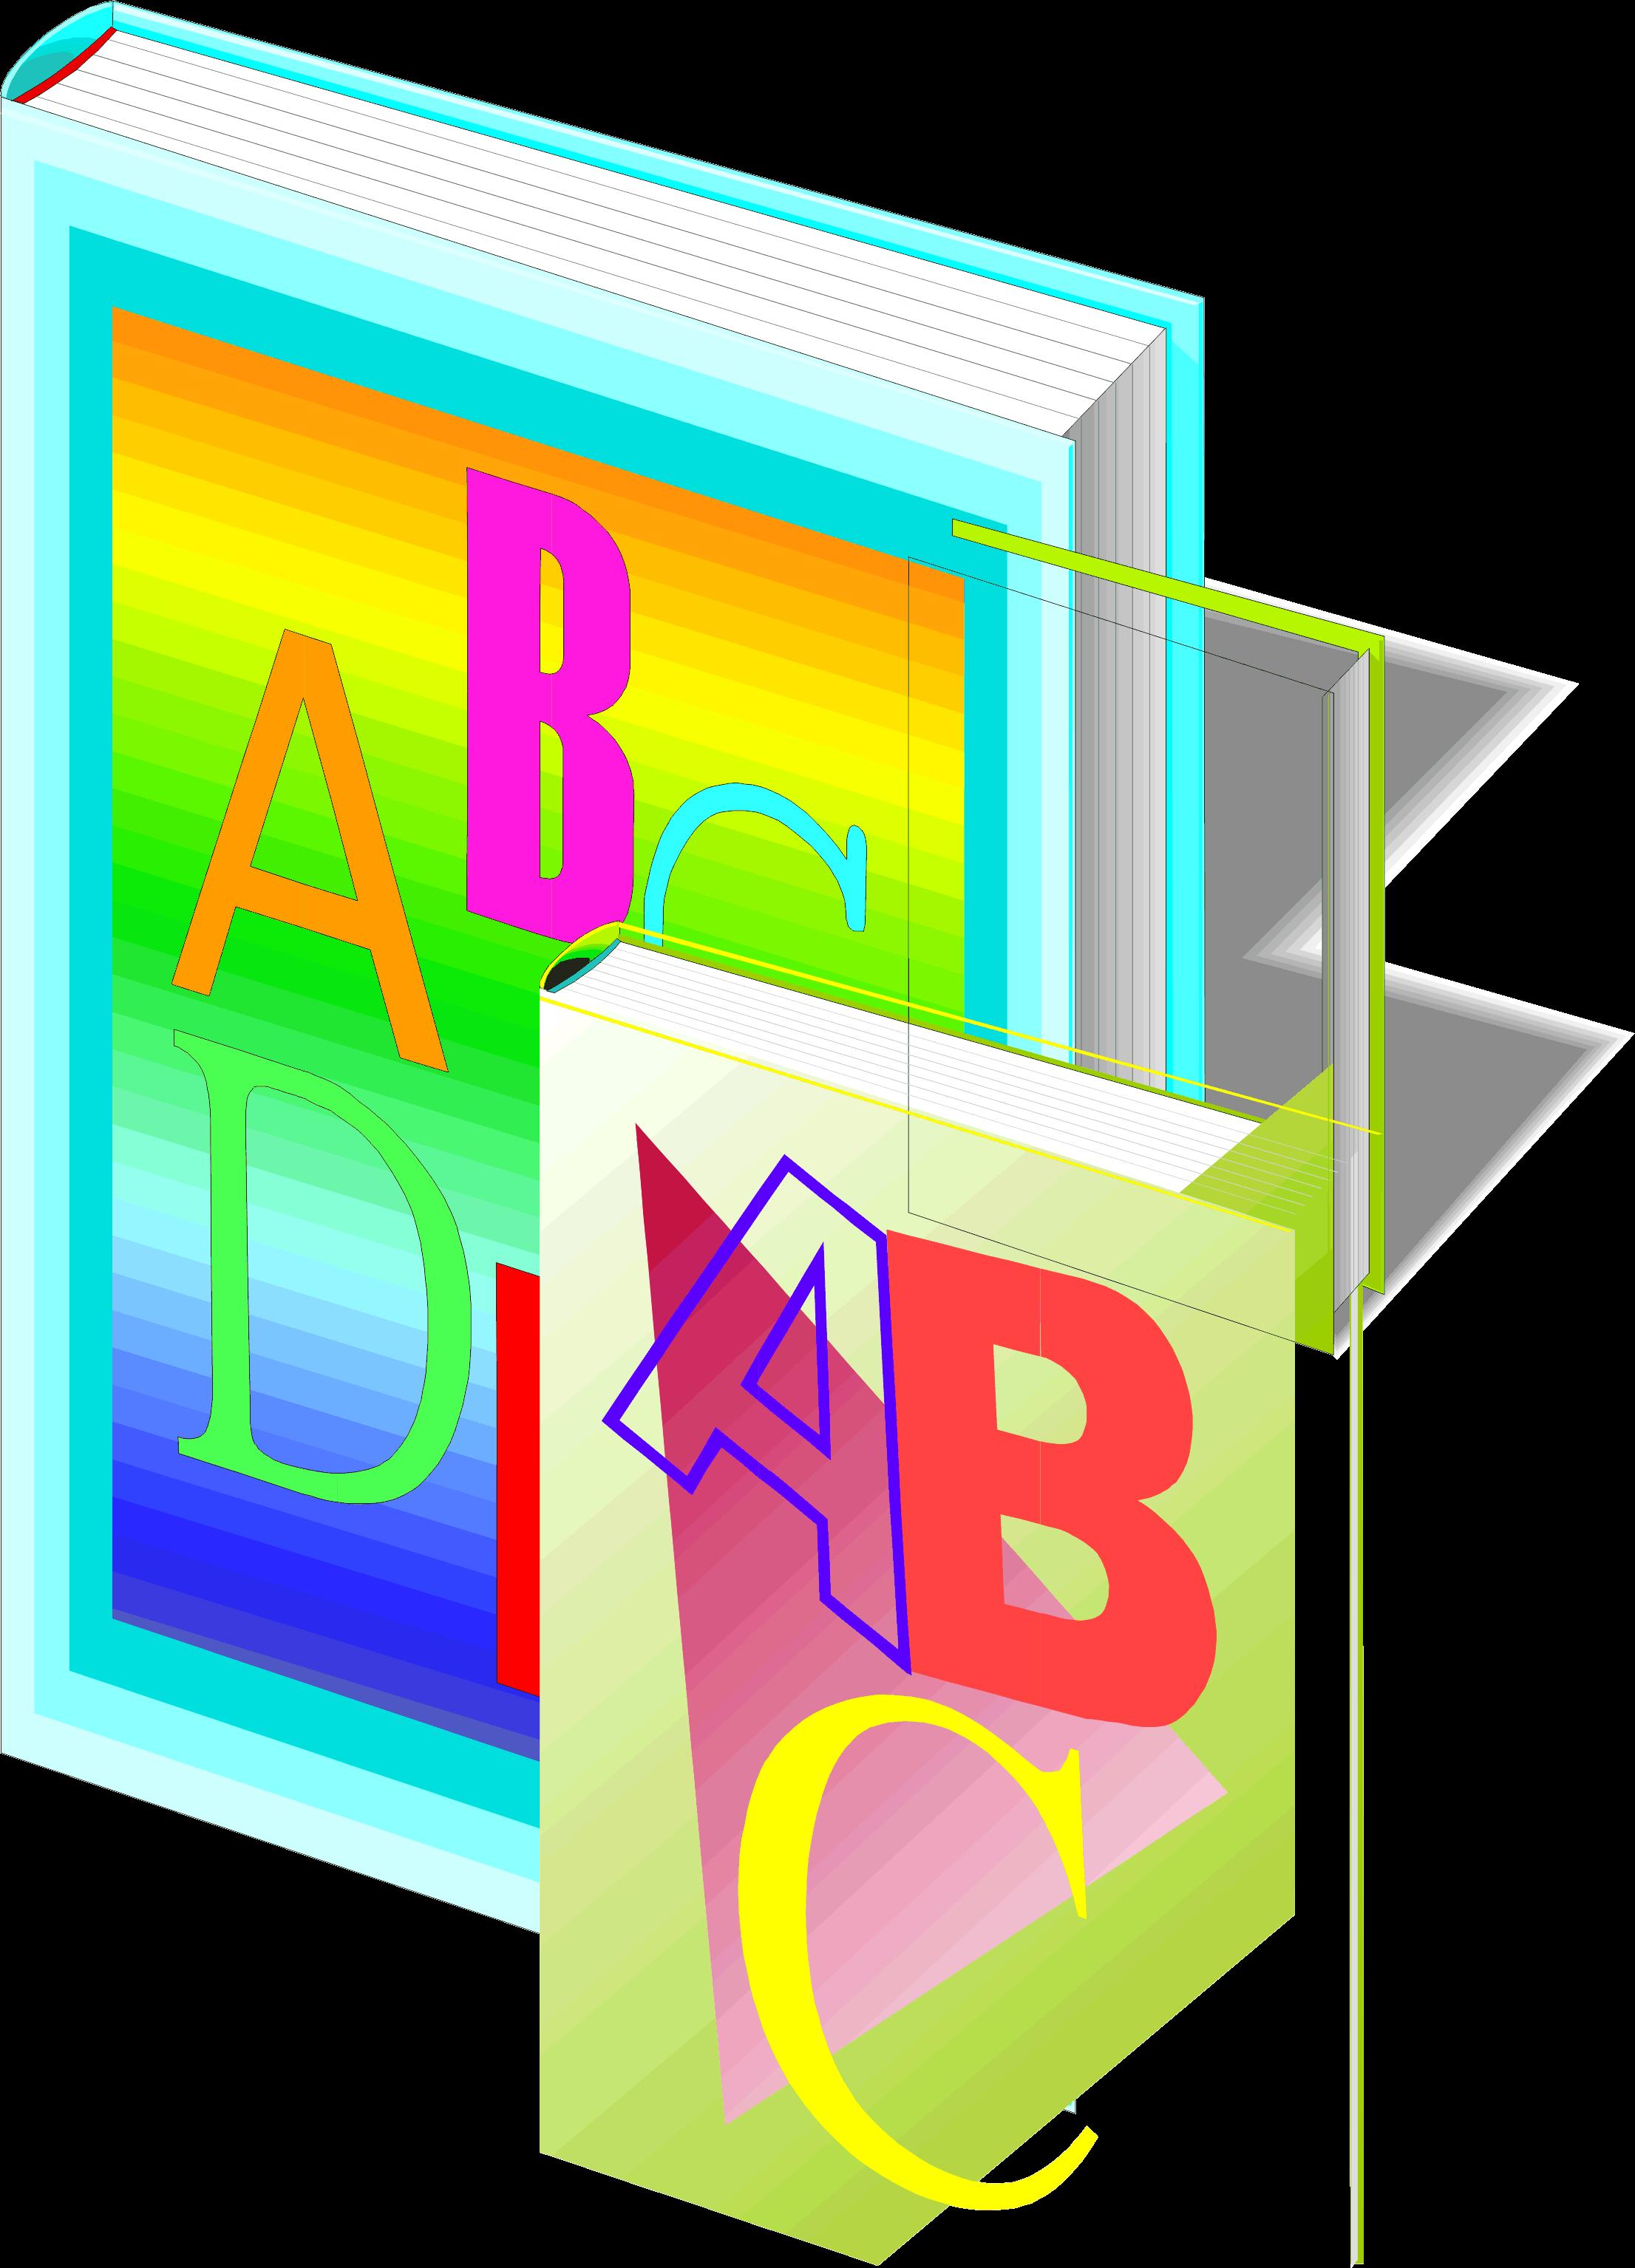 Harf yazılı kitap resmi png